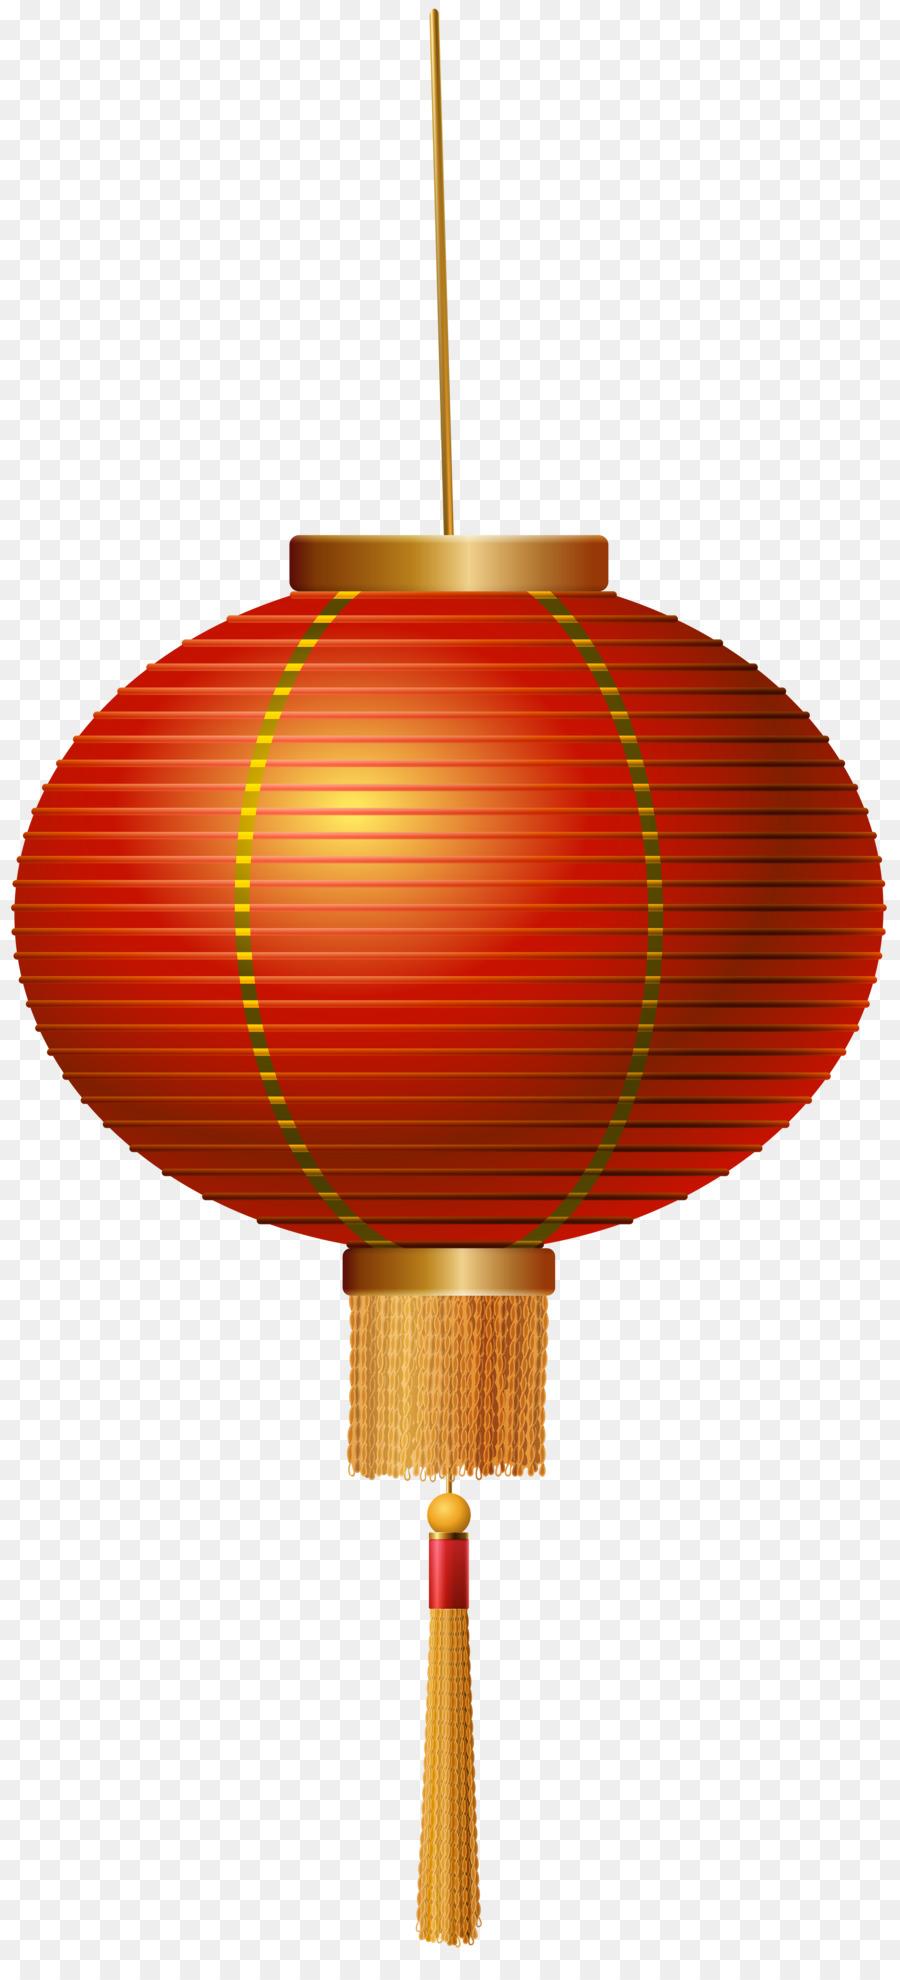 Clipart lantern jpg Chinese Lantern clipart - Paper, Orange, Lamp, transparent clip art jpg